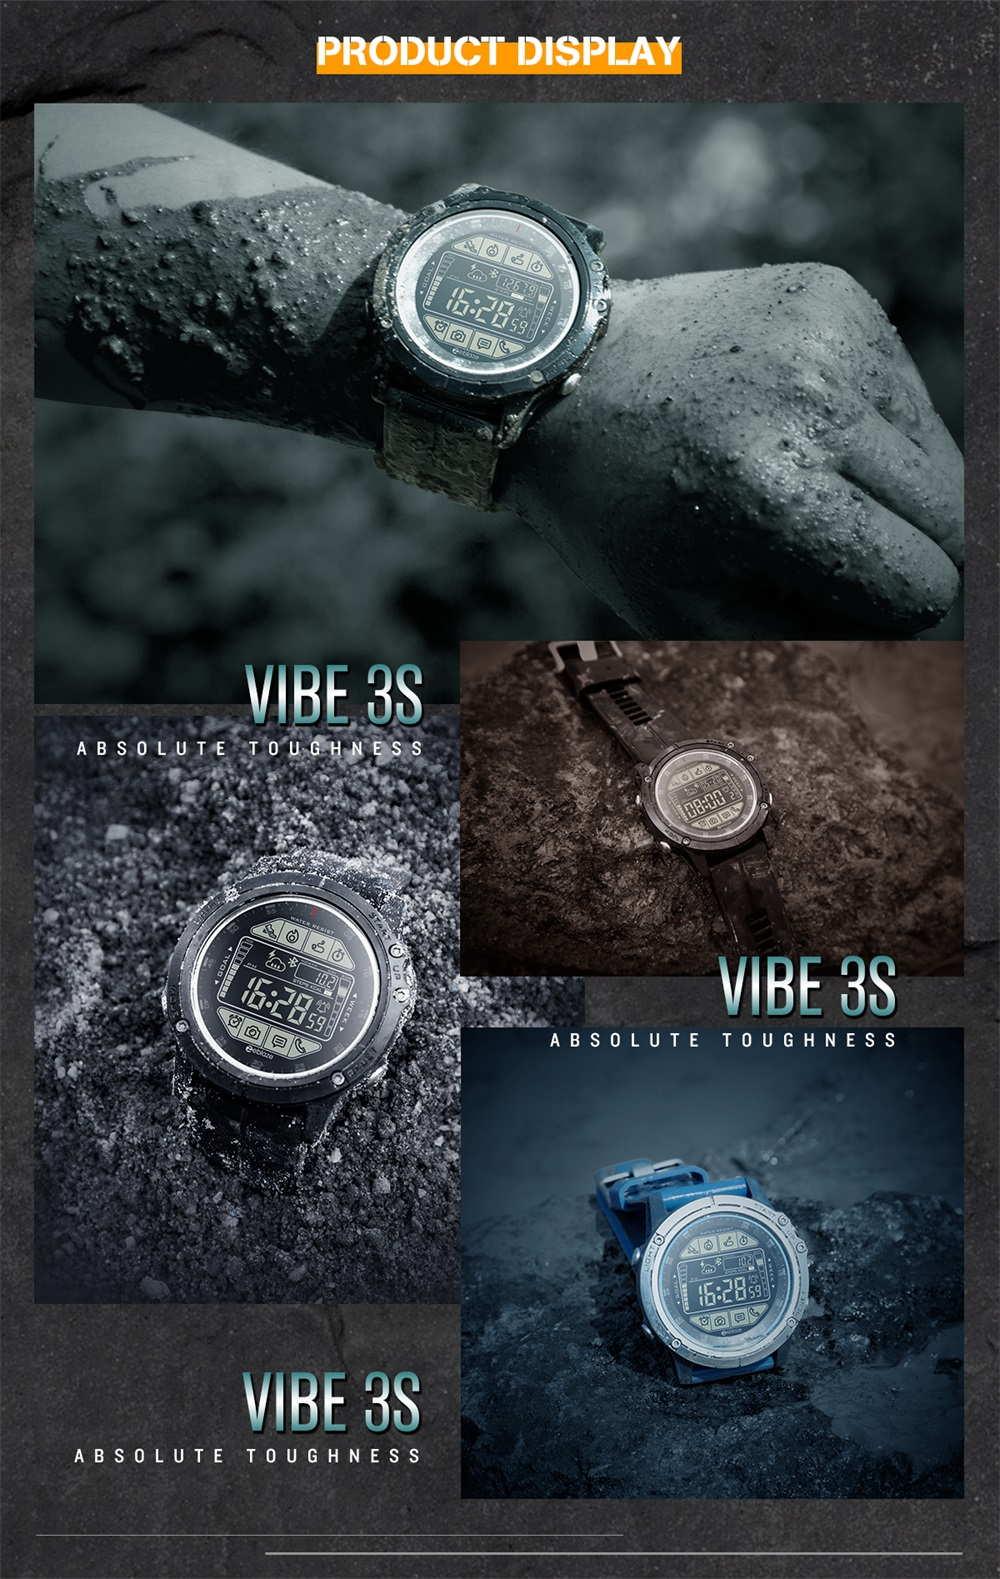 zeblaze vibe 3s smartwatch online